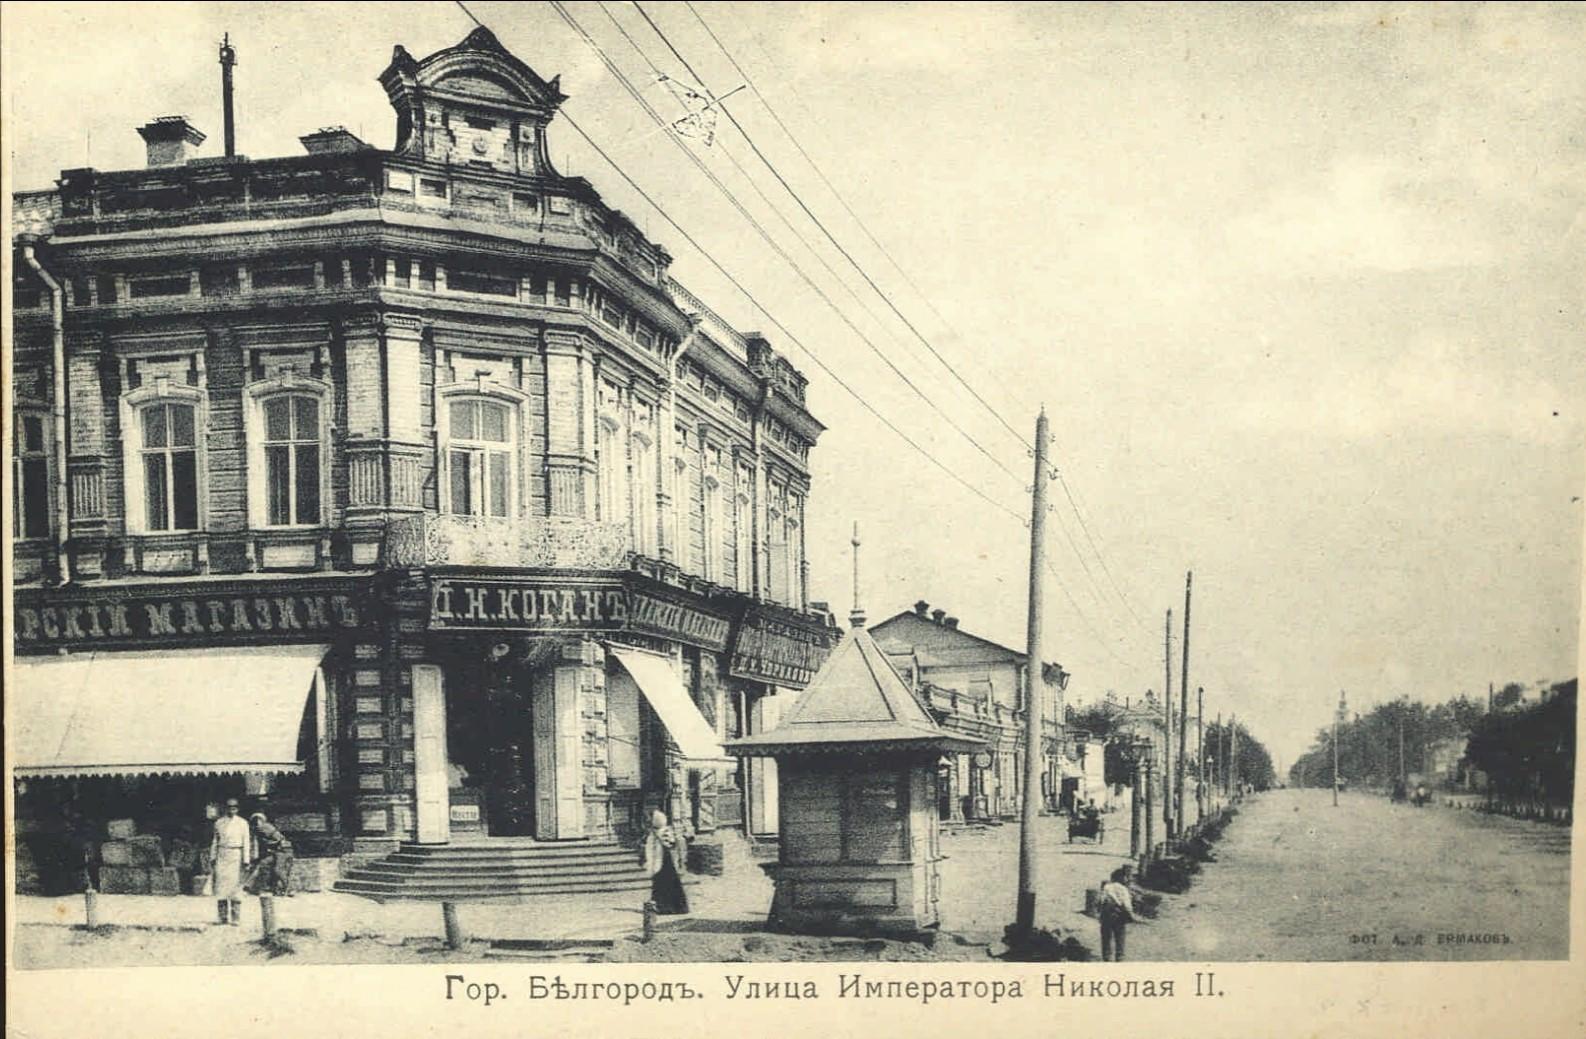 Улица императора Николая II (3)